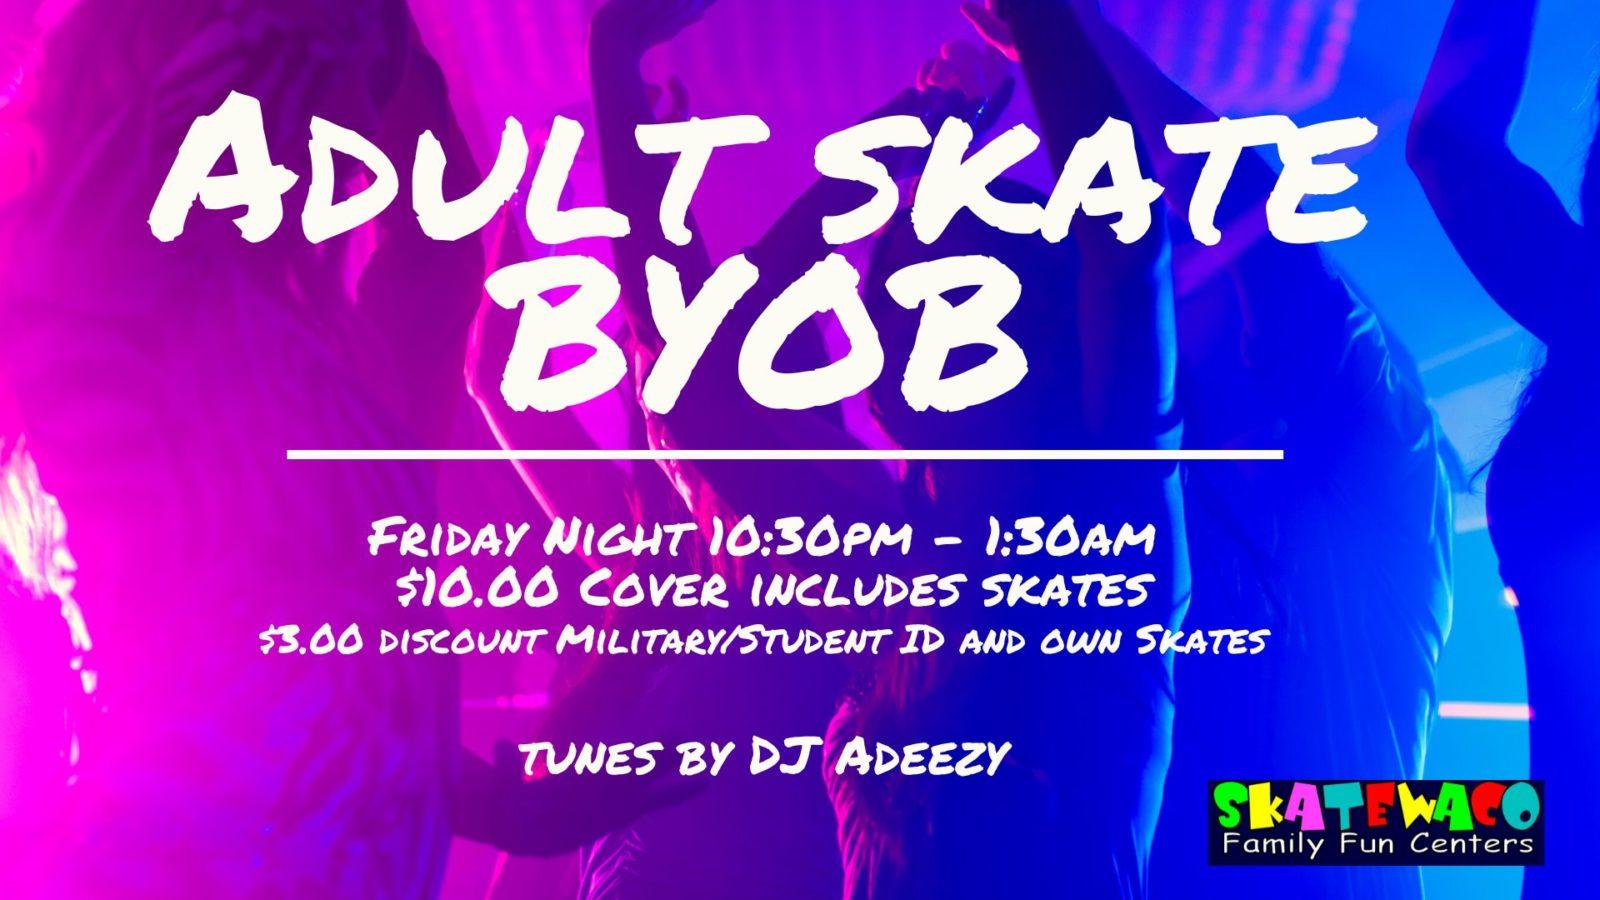 Sip N Skate BYOB Every Friday Night!